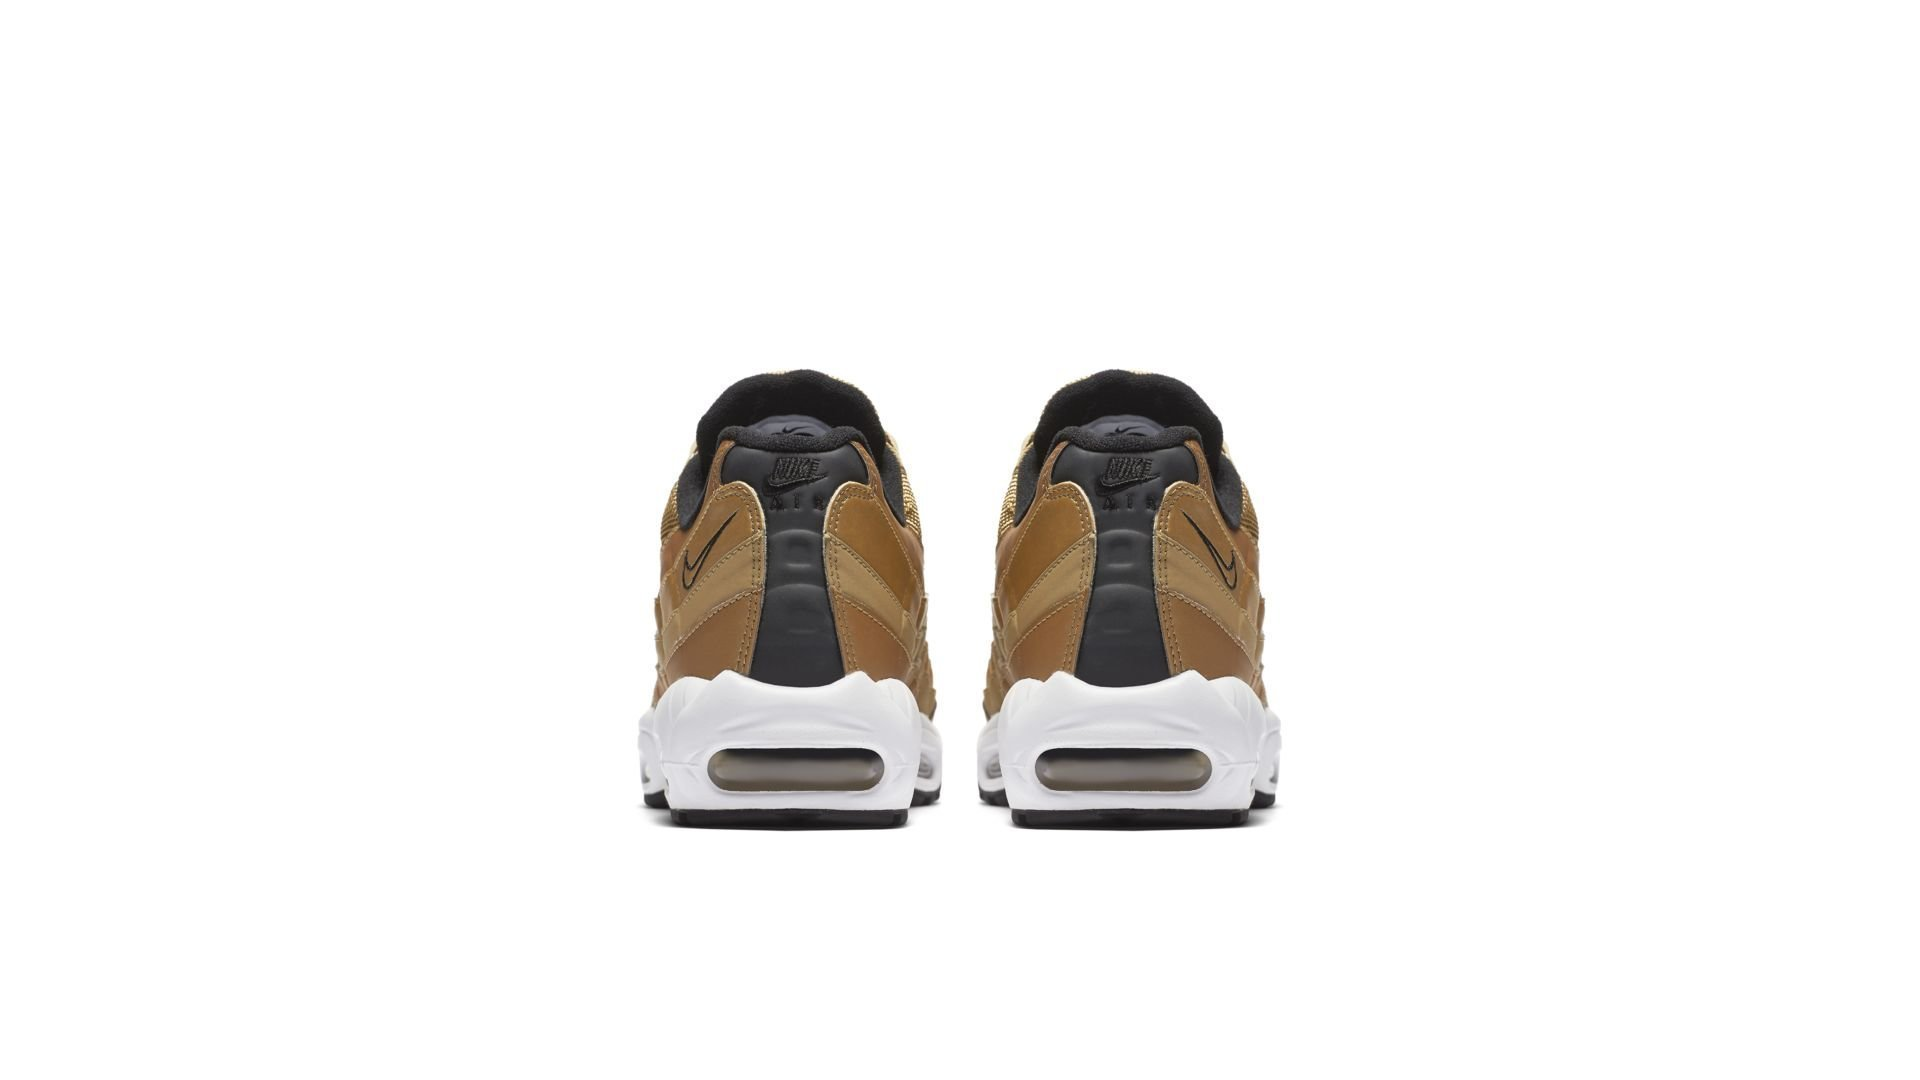 Nike Air Max 95 'Metallic Gold' (918359-700)